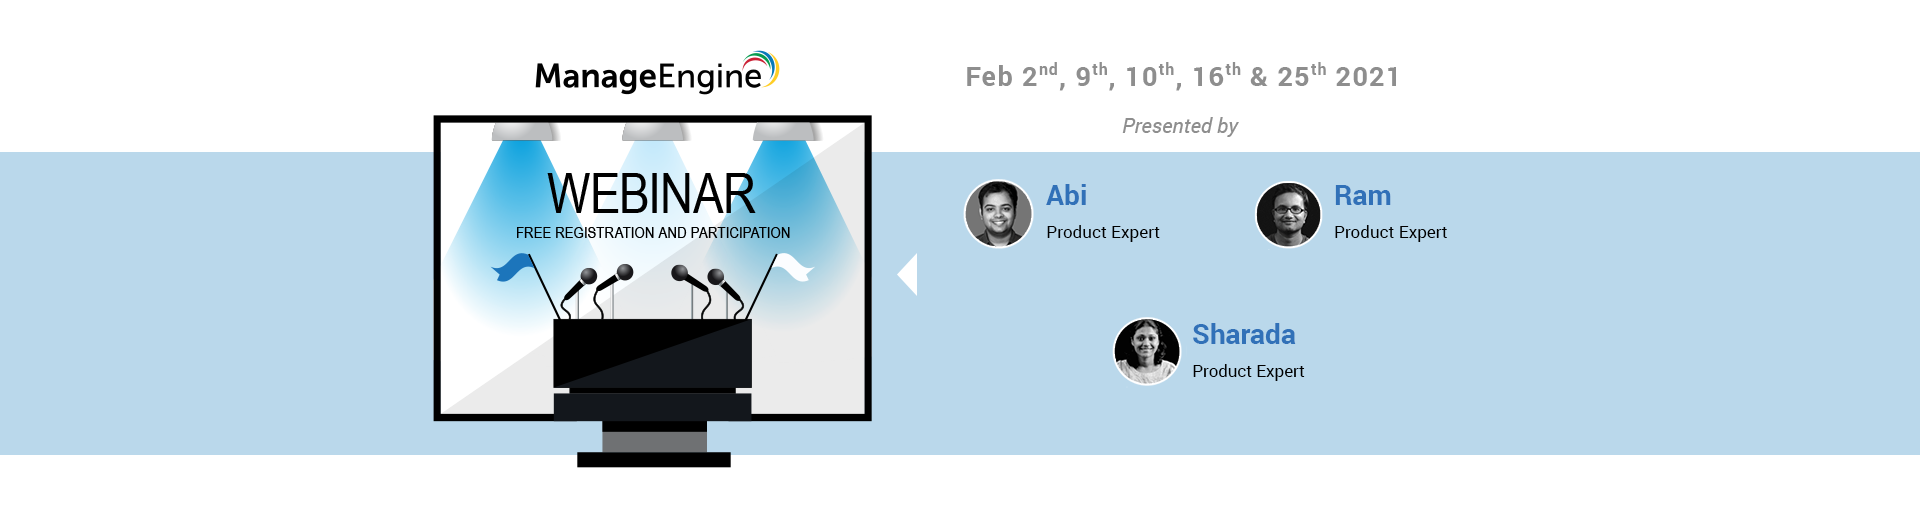 free-webinar-intro banner-feb-2021